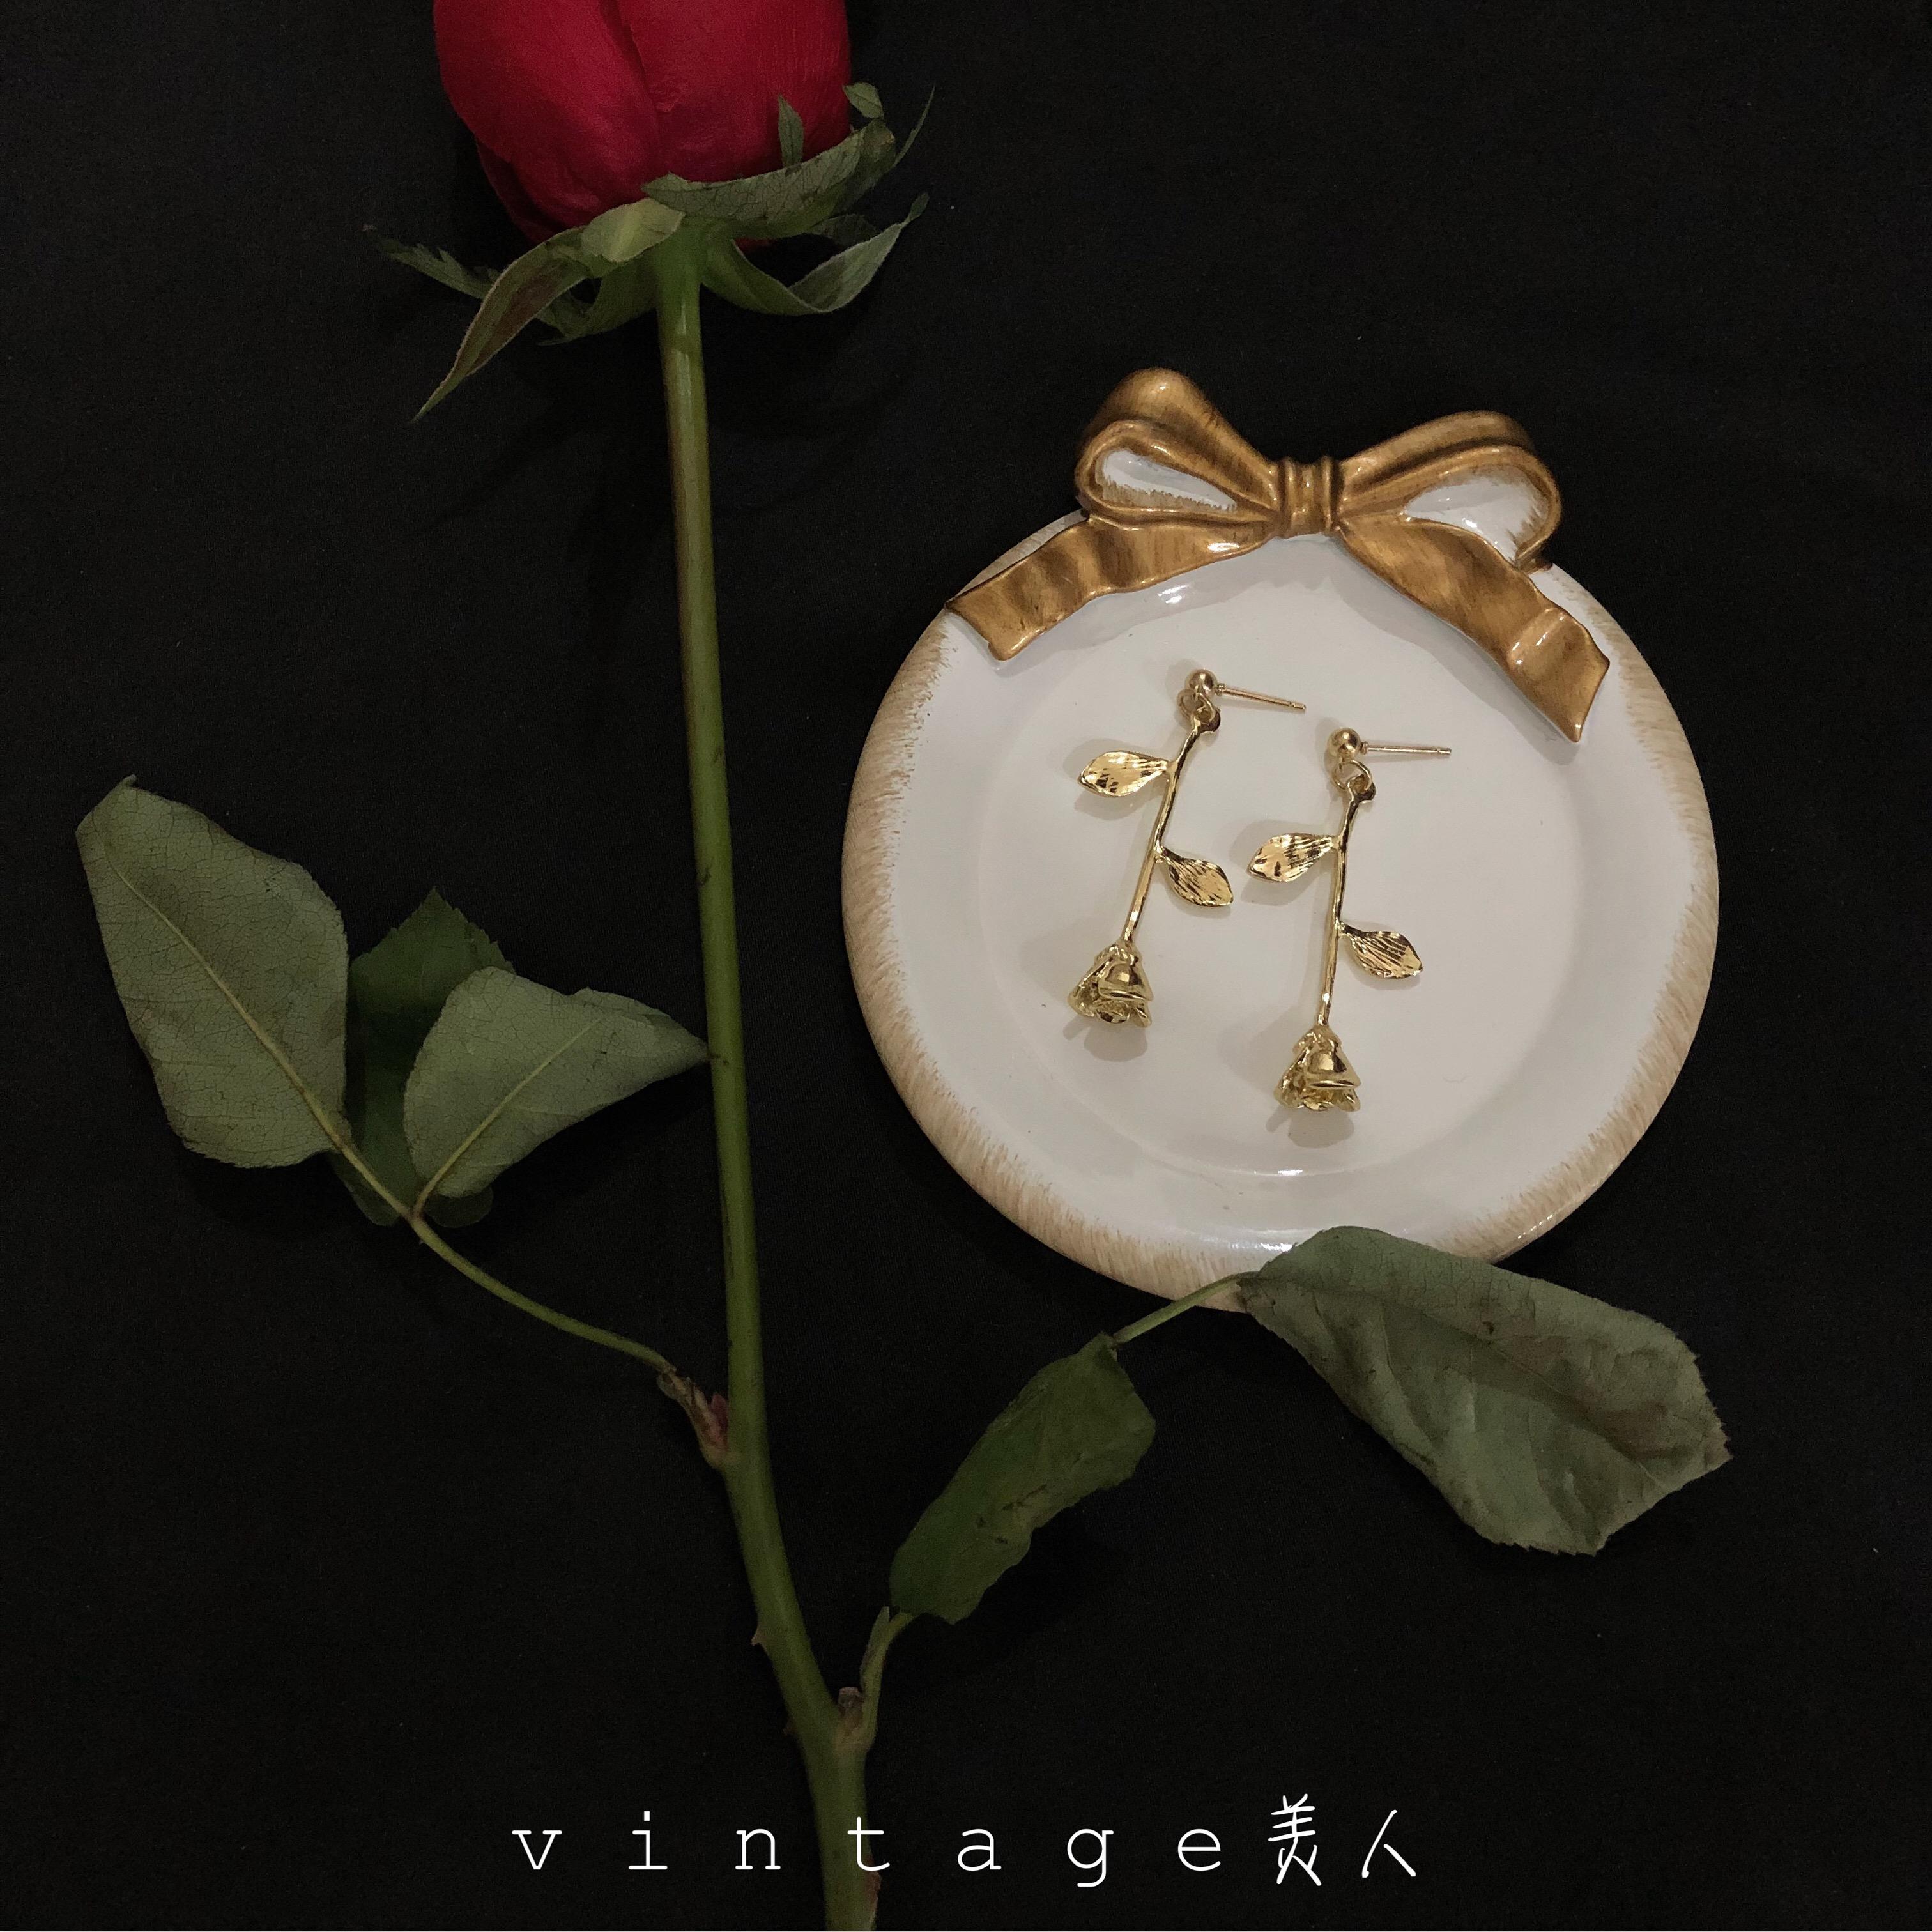 Manchester金色玫瑰 复古巴洛克浪漫抽象派油画感金玫瑰耳环耳坠